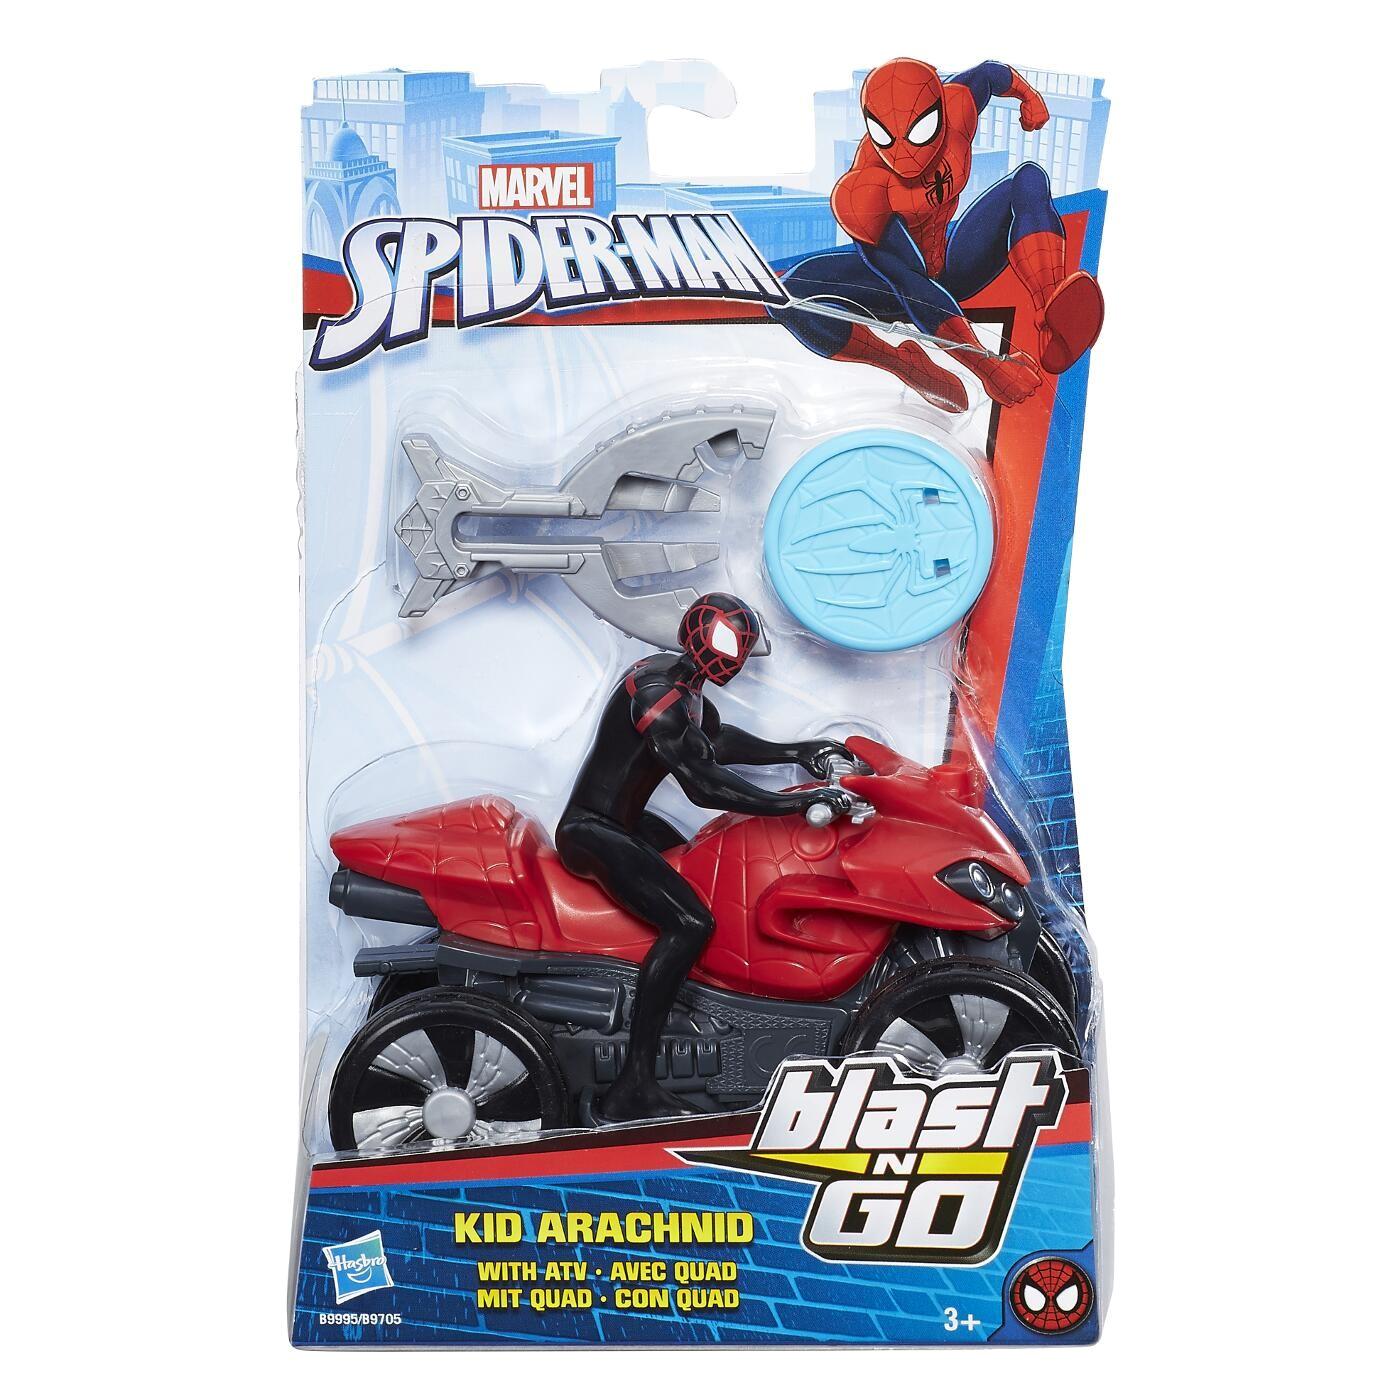 SPIDERMAN BLAST N GO